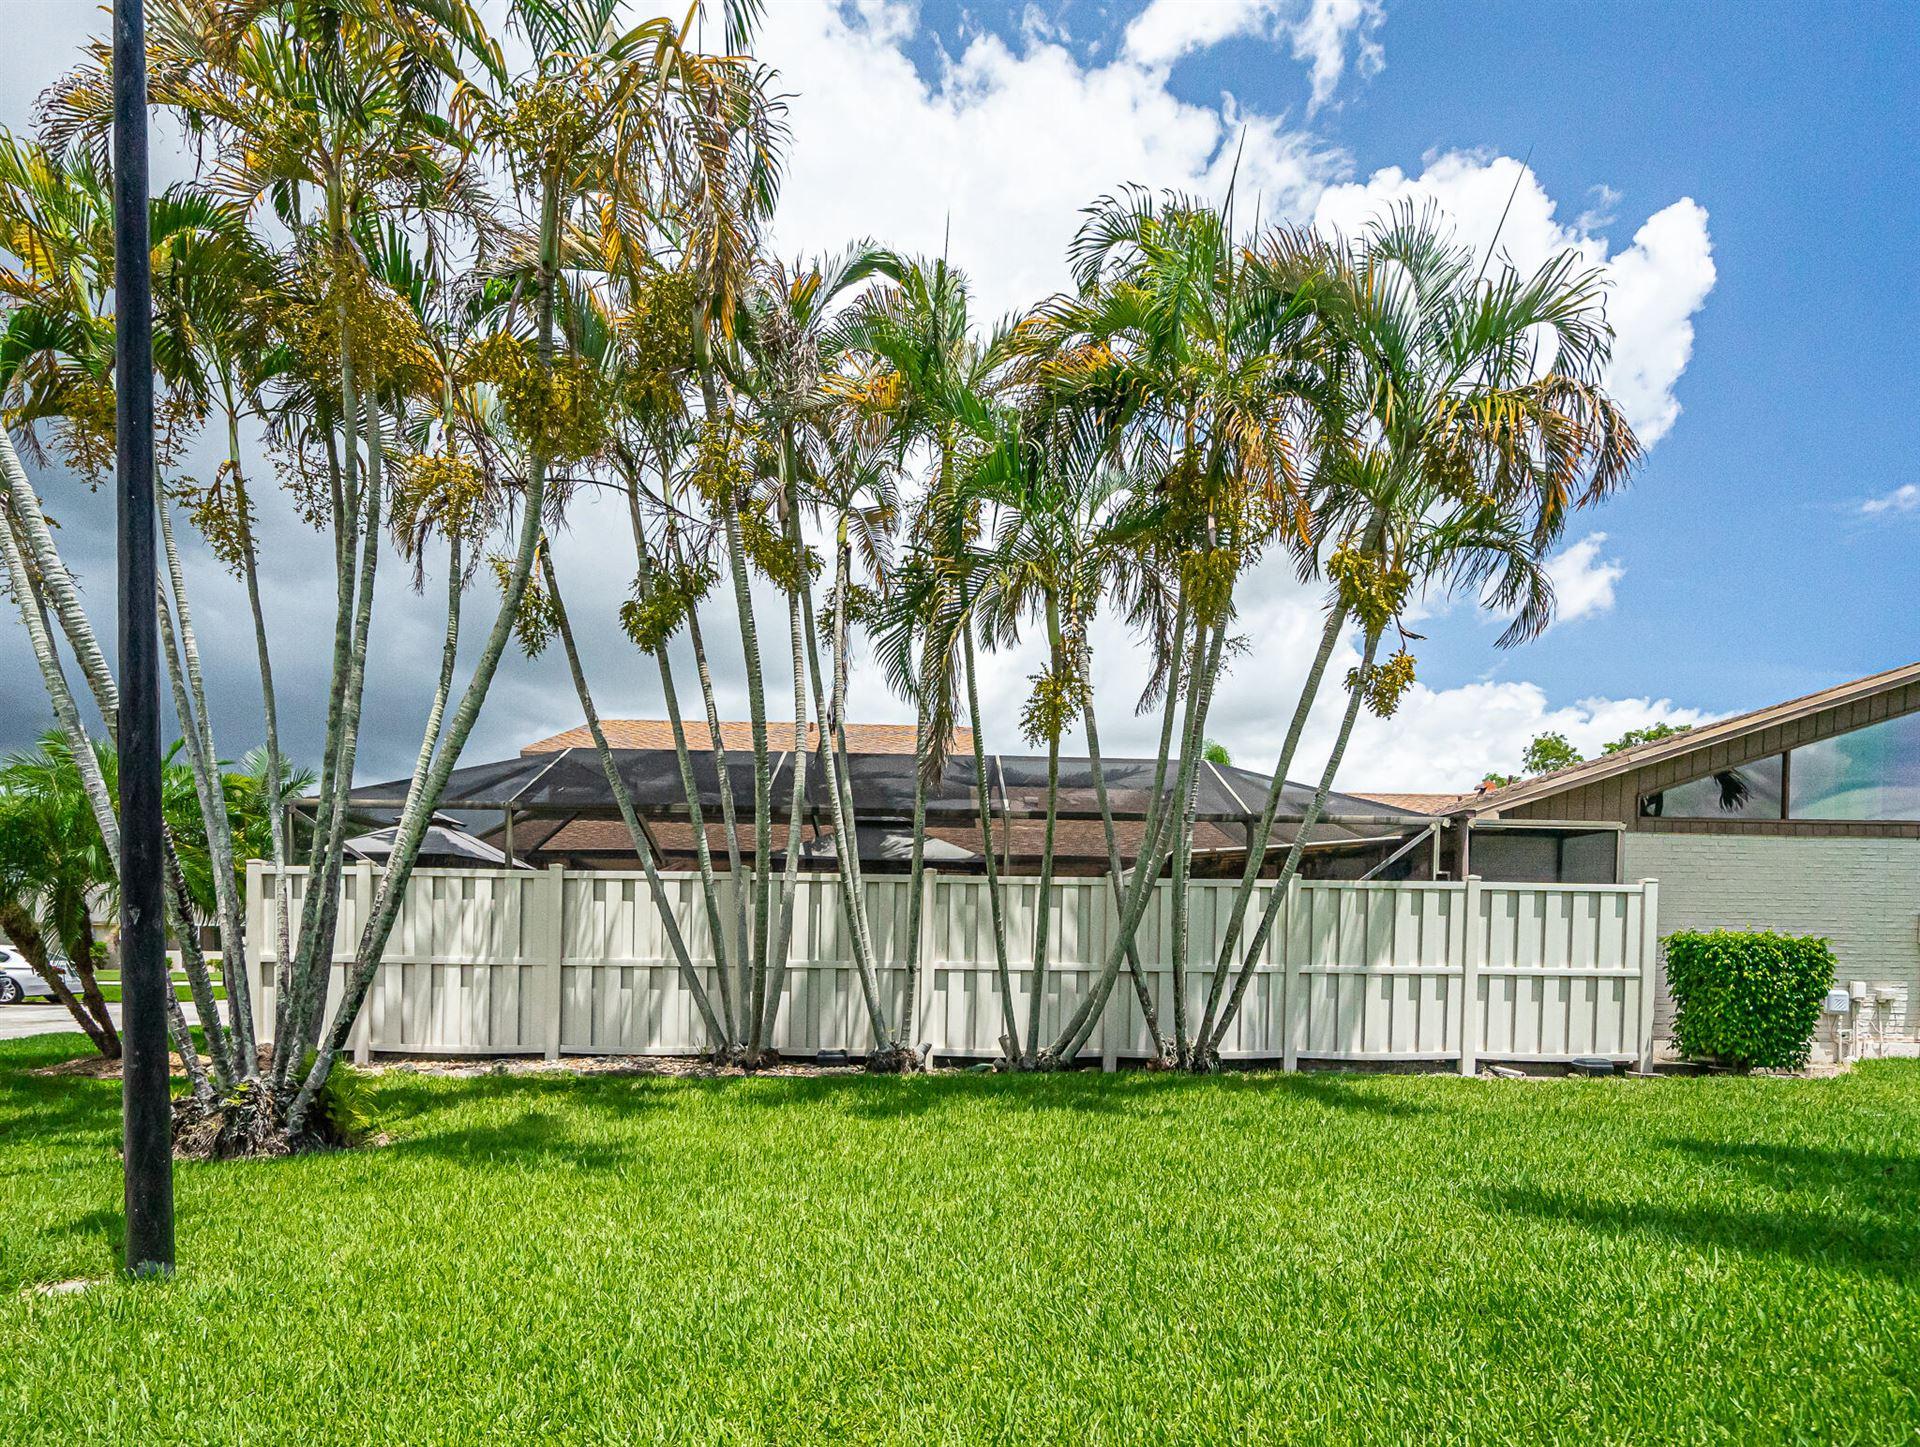 Photo of 9816 Boca Gardens Circle N #D, Boca Raton, FL 33496 (MLS # RX-10733546)